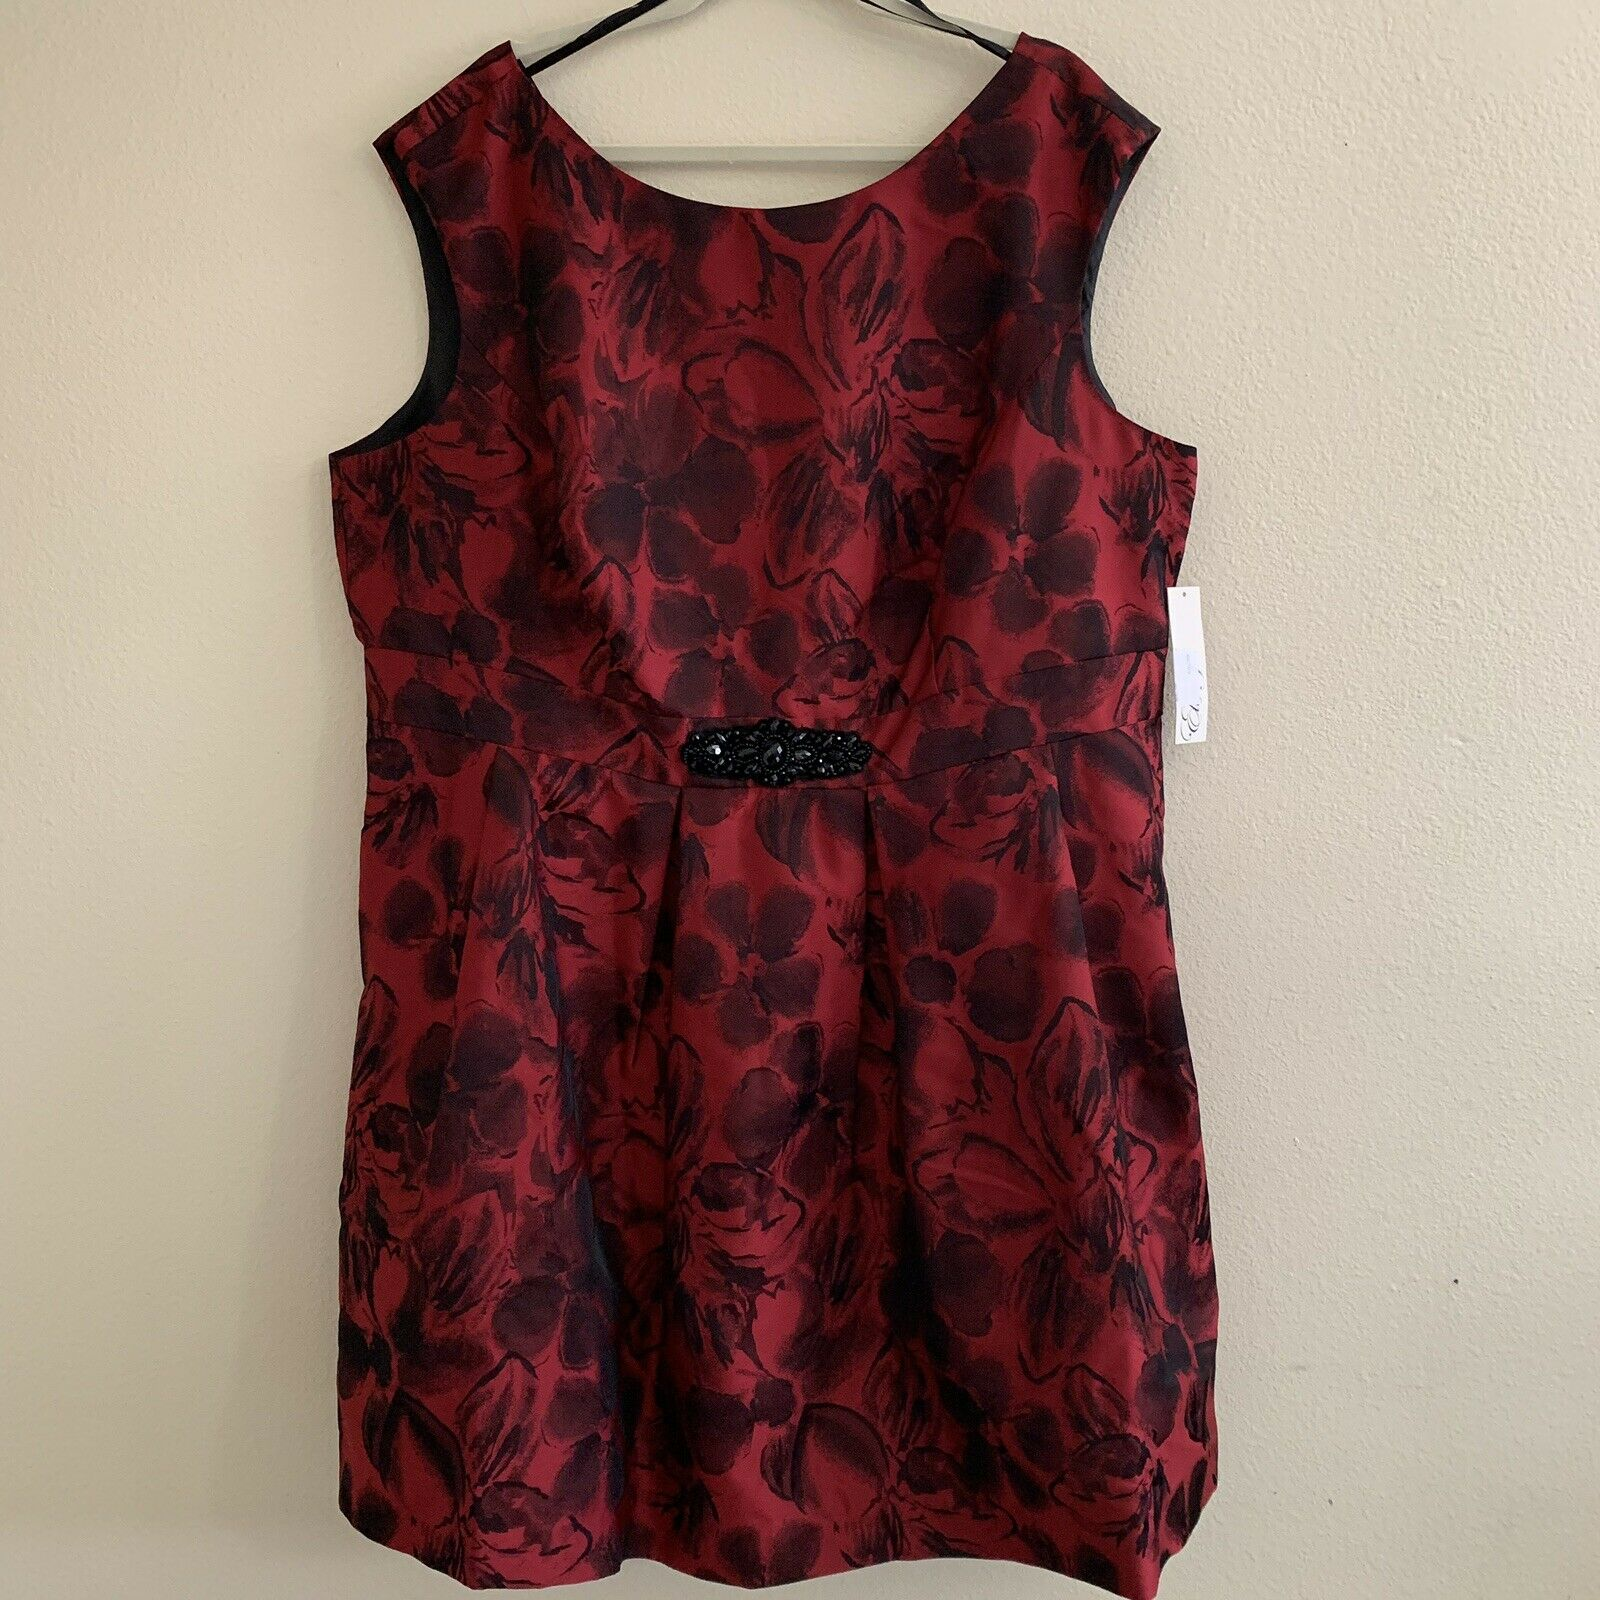 Eliza J plus Größe 22W dress rot floral print cap sleeves jacquard pleated tulle